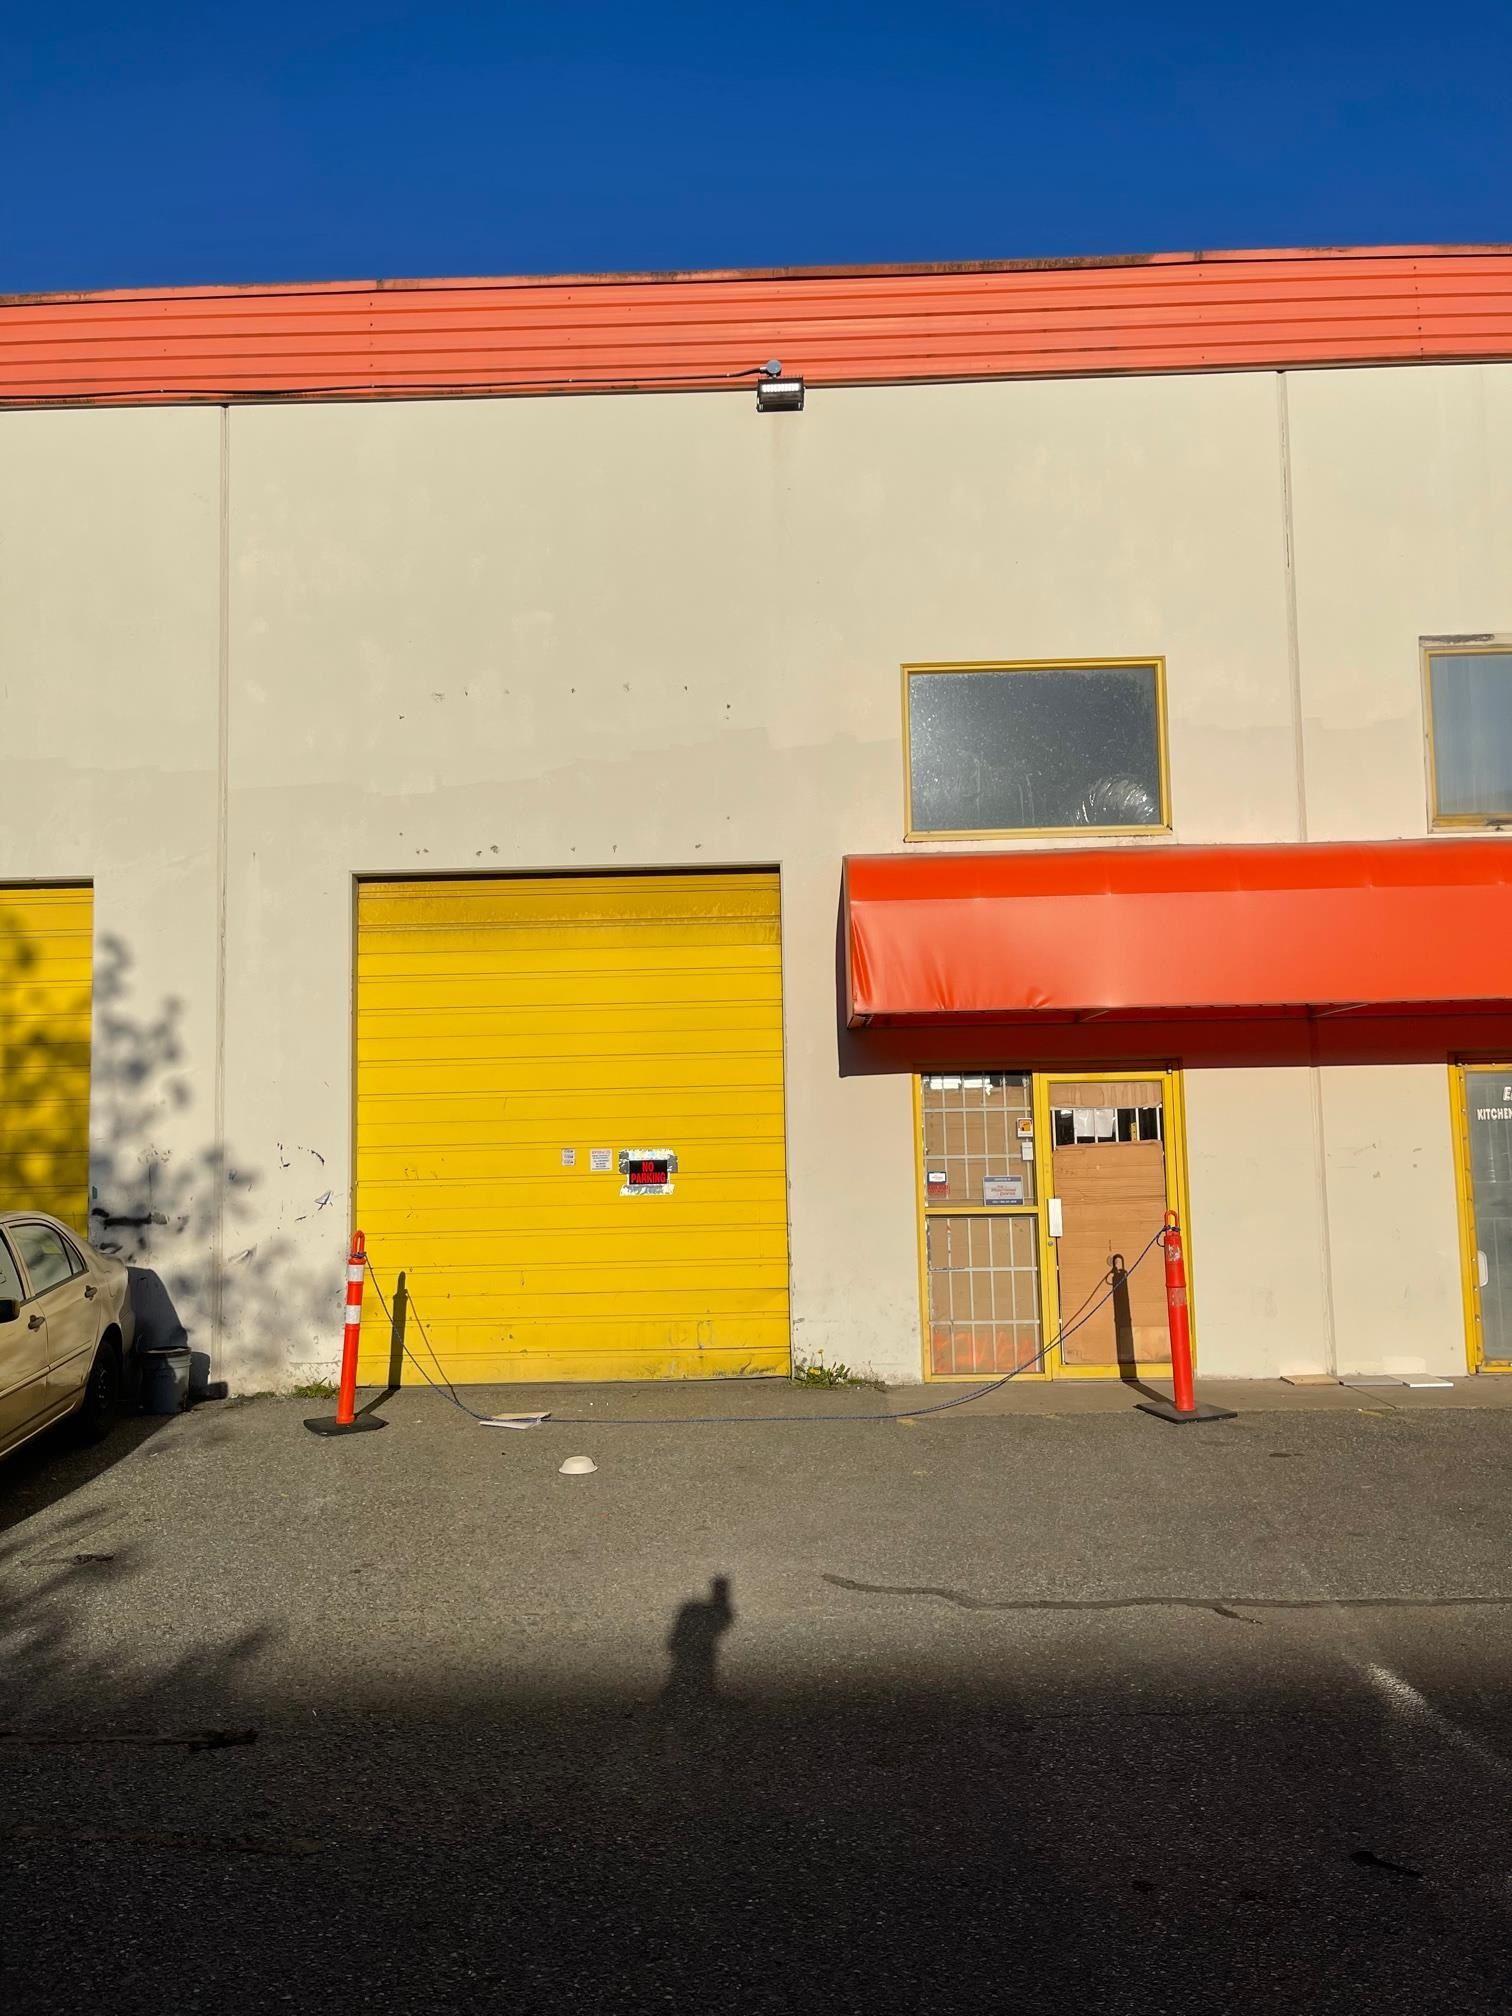 Main Photo: 119 12465 82 Avenue in Surrey: Queen Mary Park Surrey Industrial for sale : MLS®# C8040268